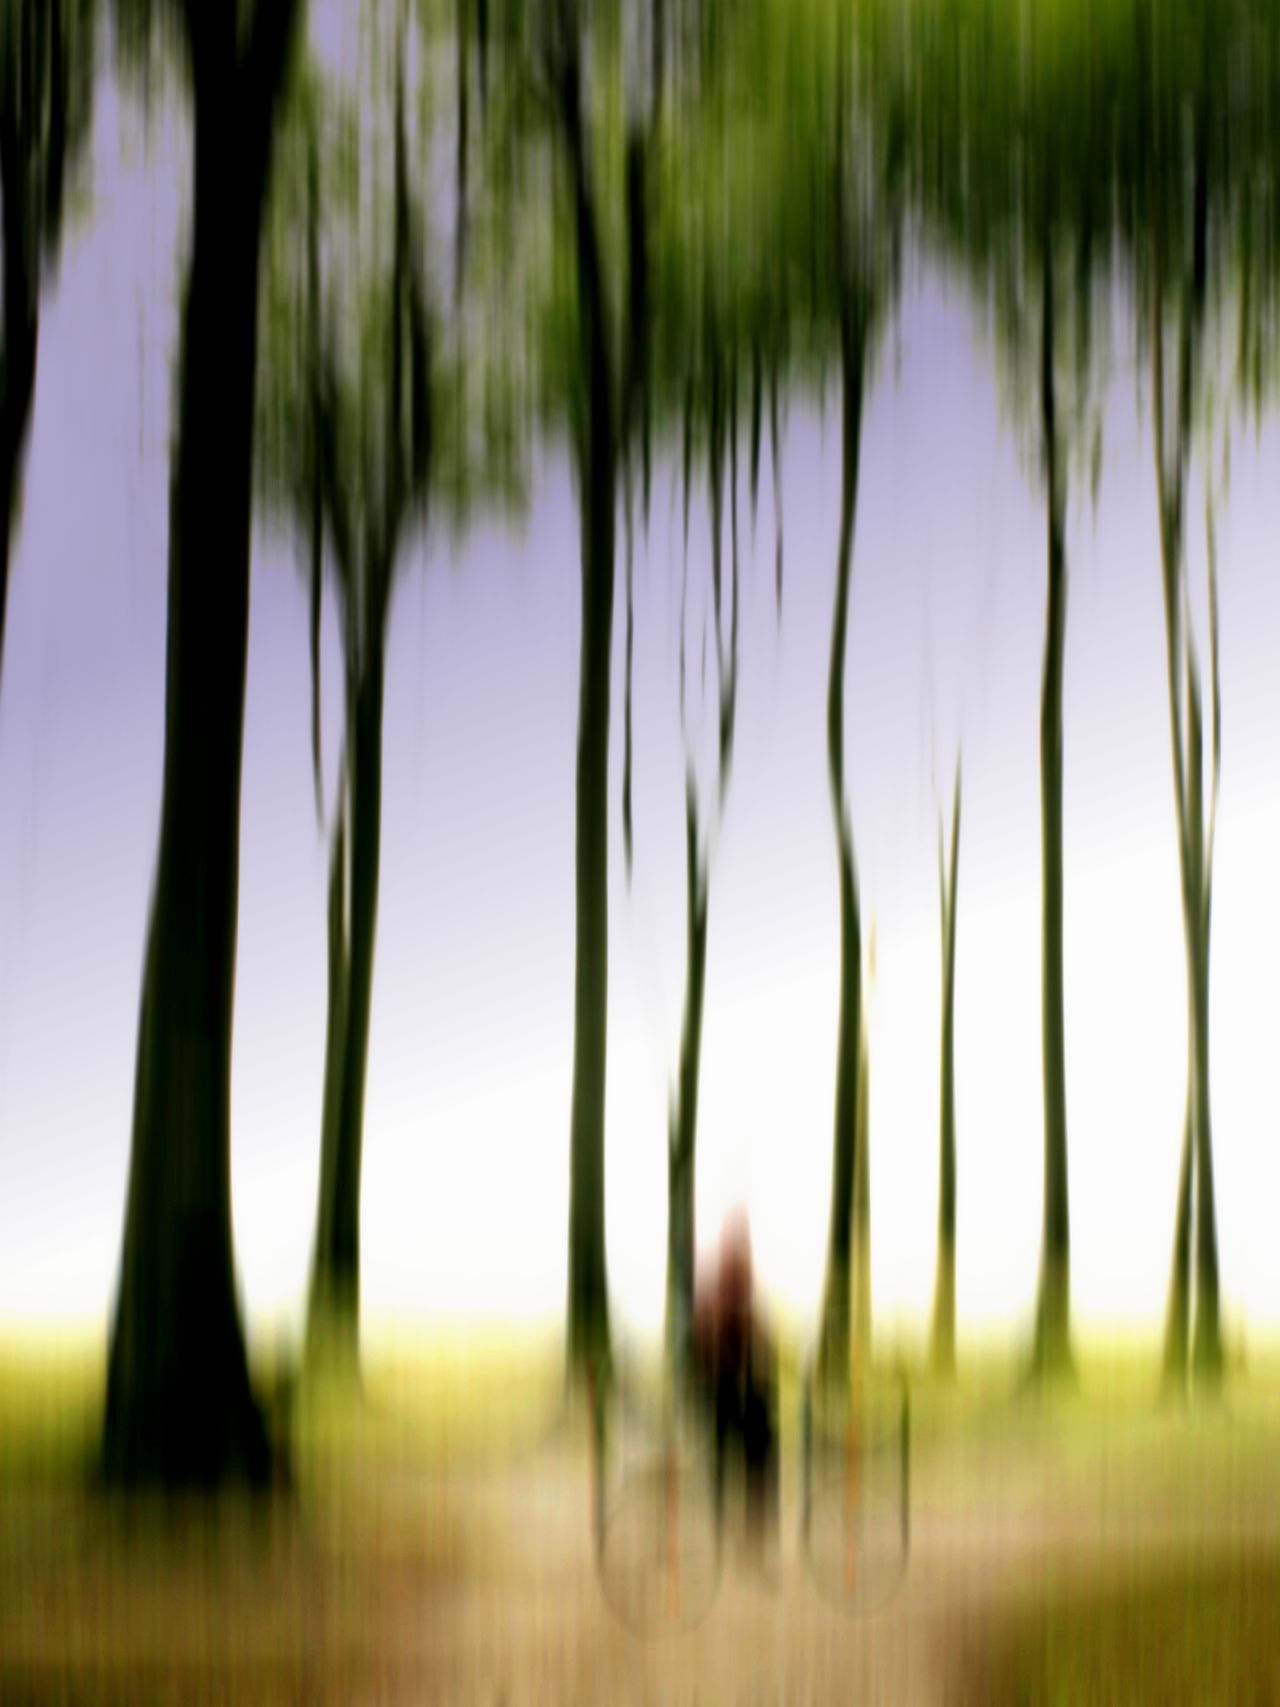 Radfahrer fährt durch Gespensterwald ANGST Angsty Beauty In Nature Day Fahrrad Geist Geister Geisterbild Geisterhaft Gespenster Gespensterwald Nature One Person Outdoors Radfahrer Tree Unscharf Unschärfe Wald Waldspaziergang